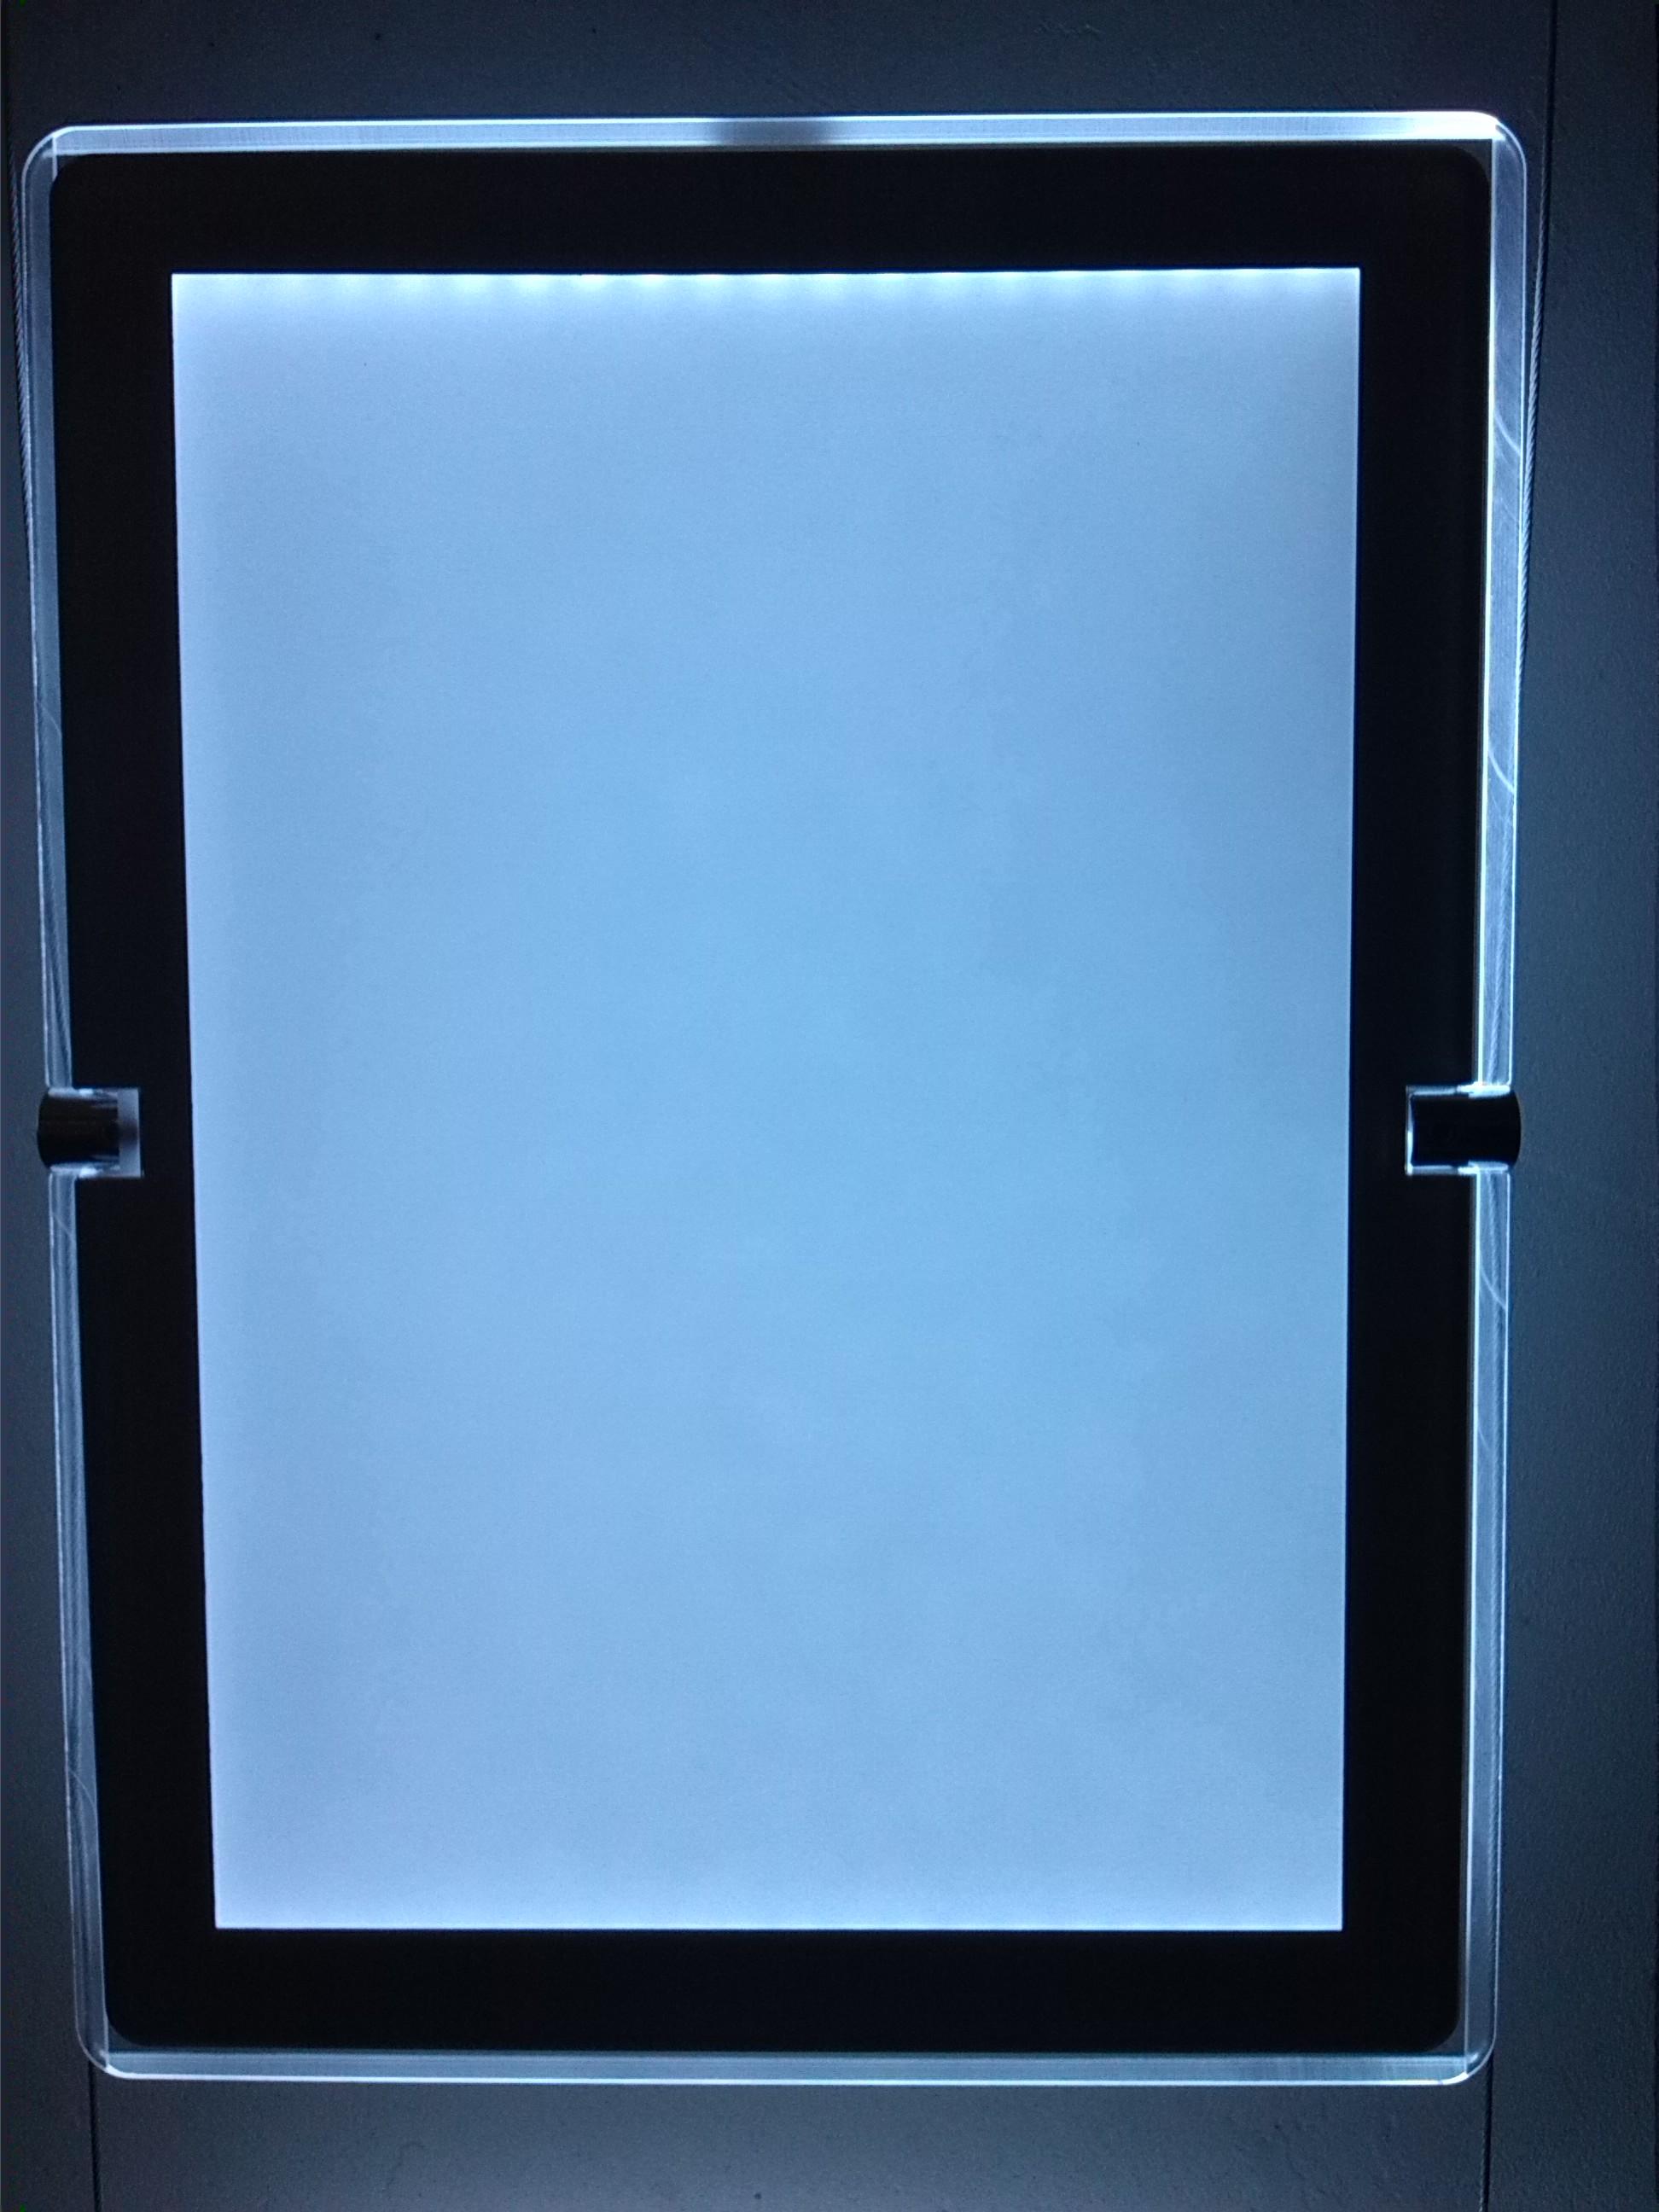 Super slim light box for window display